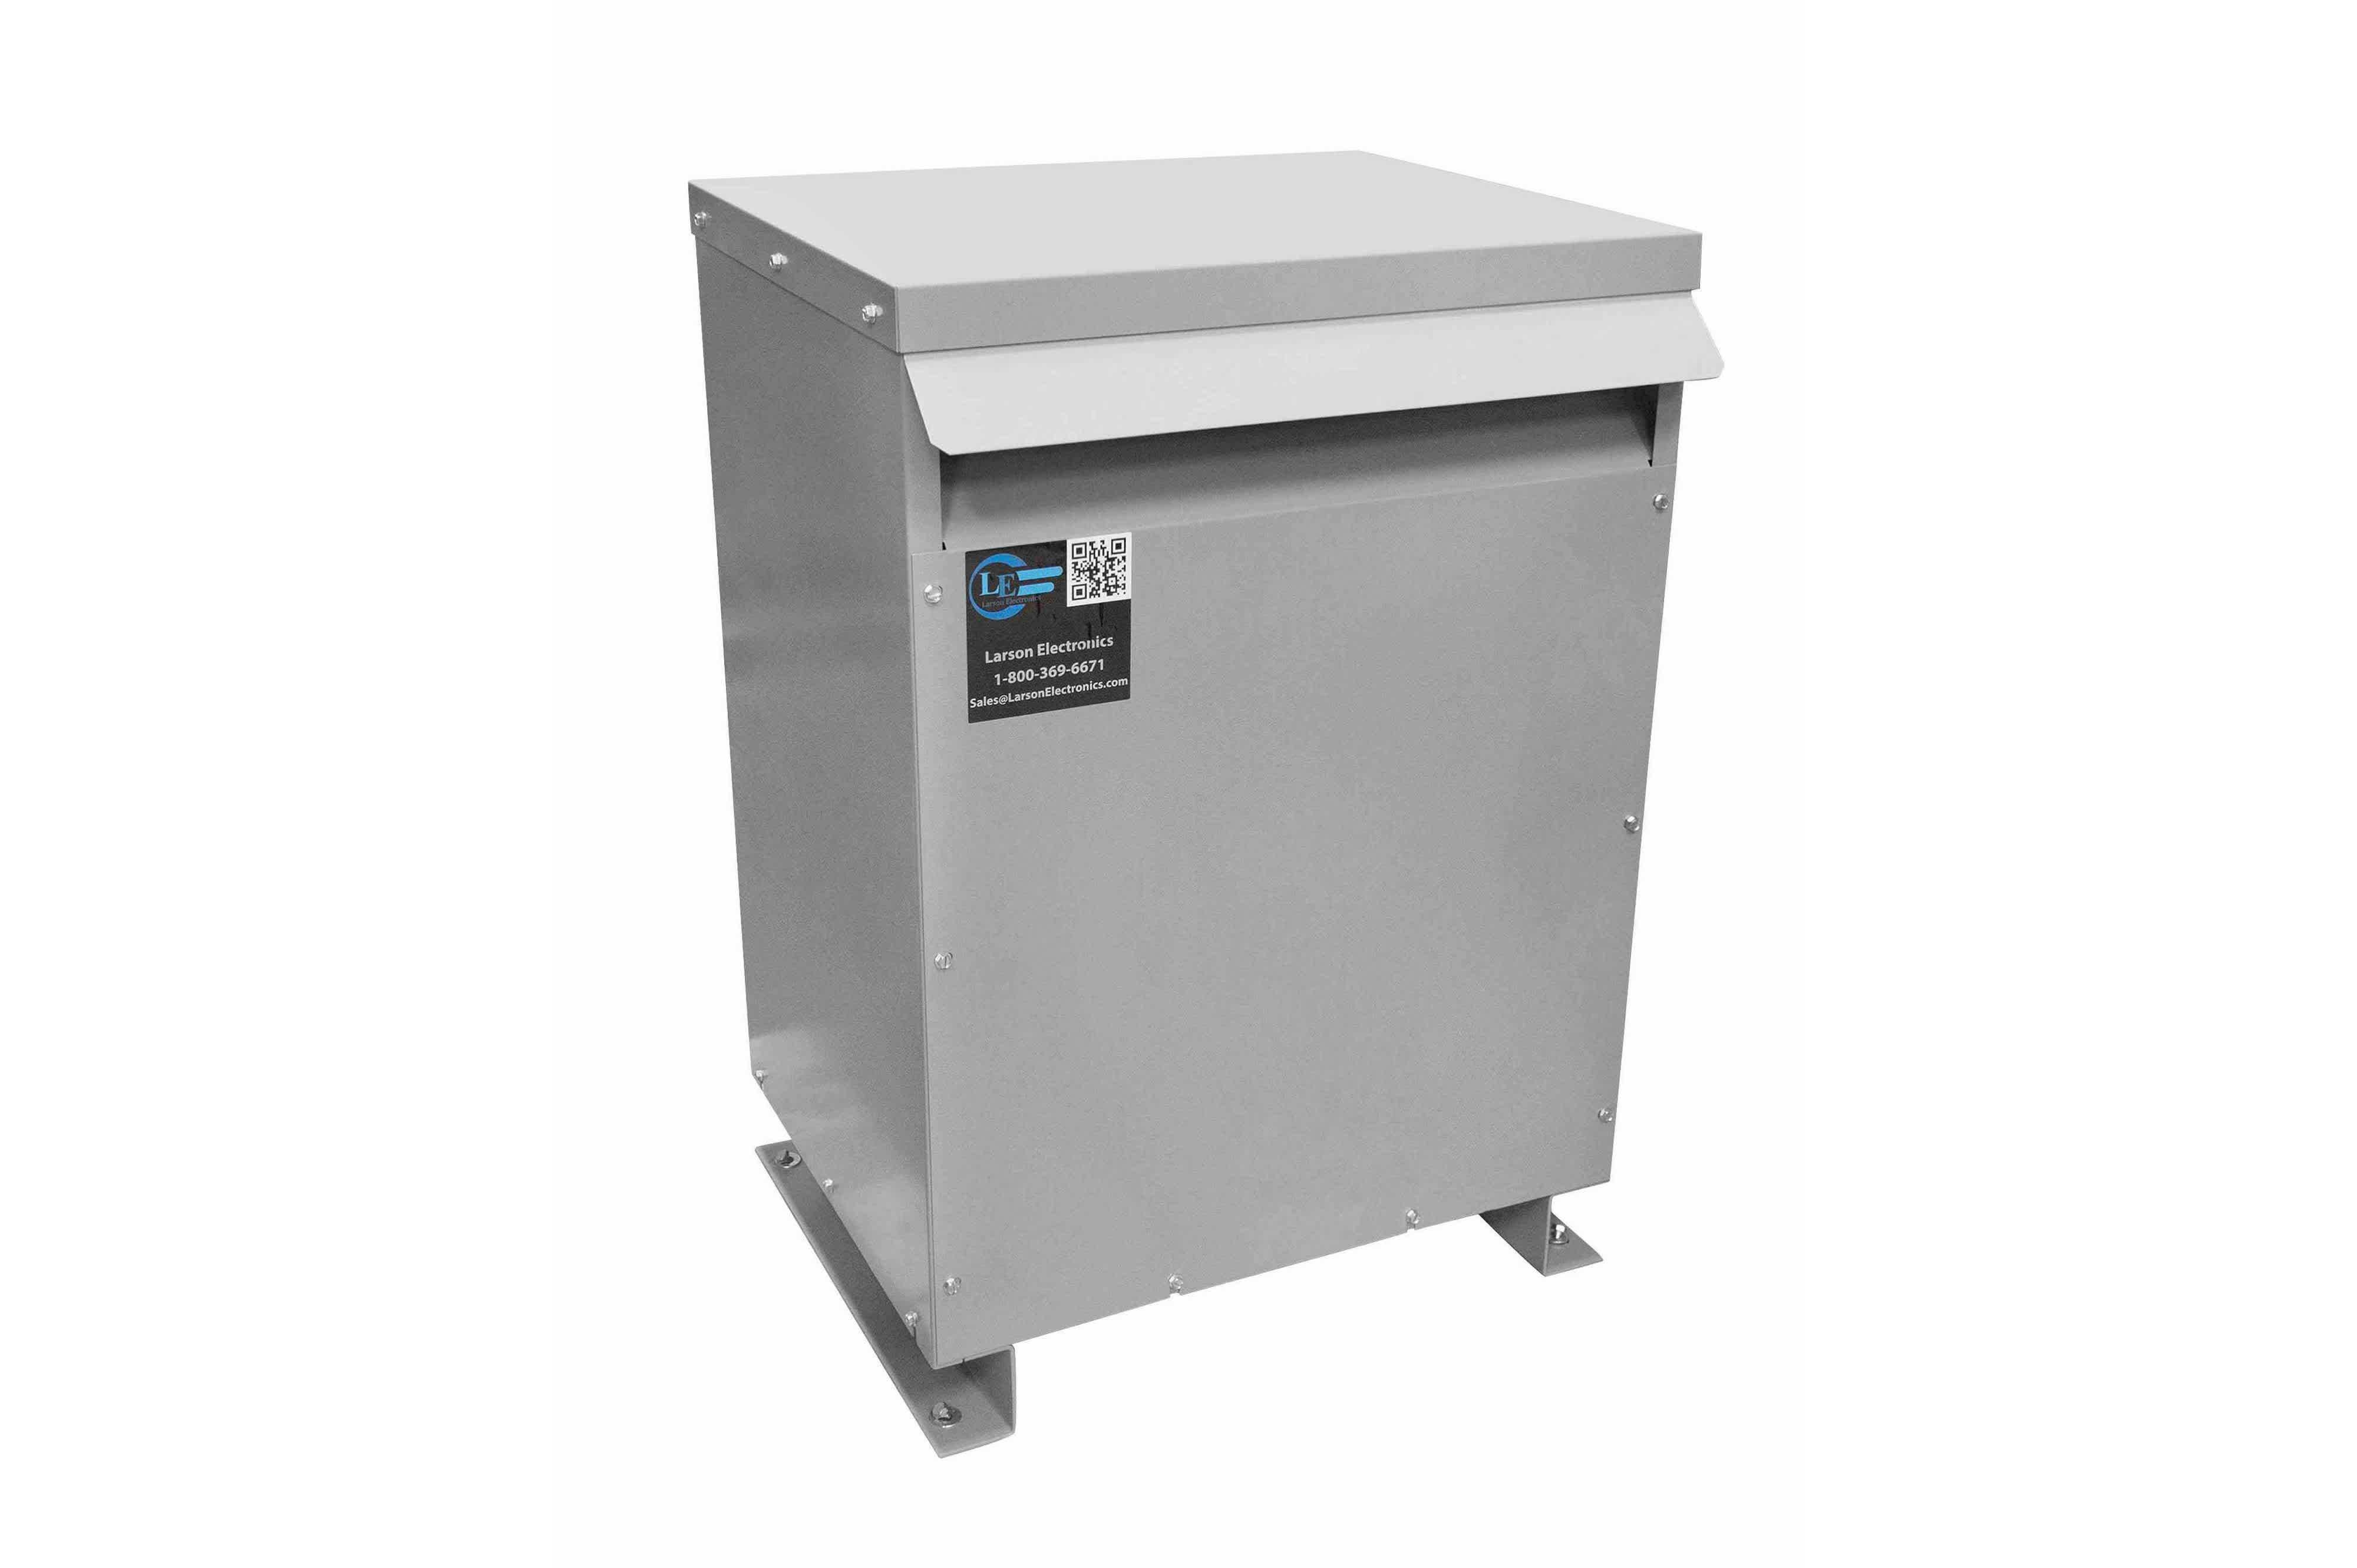 167 kVA 3PH DOE Transformer, 240V Delta Primary, 480Y/277 Wye-N Secondary, N3R, Ventilated, 60 Hz